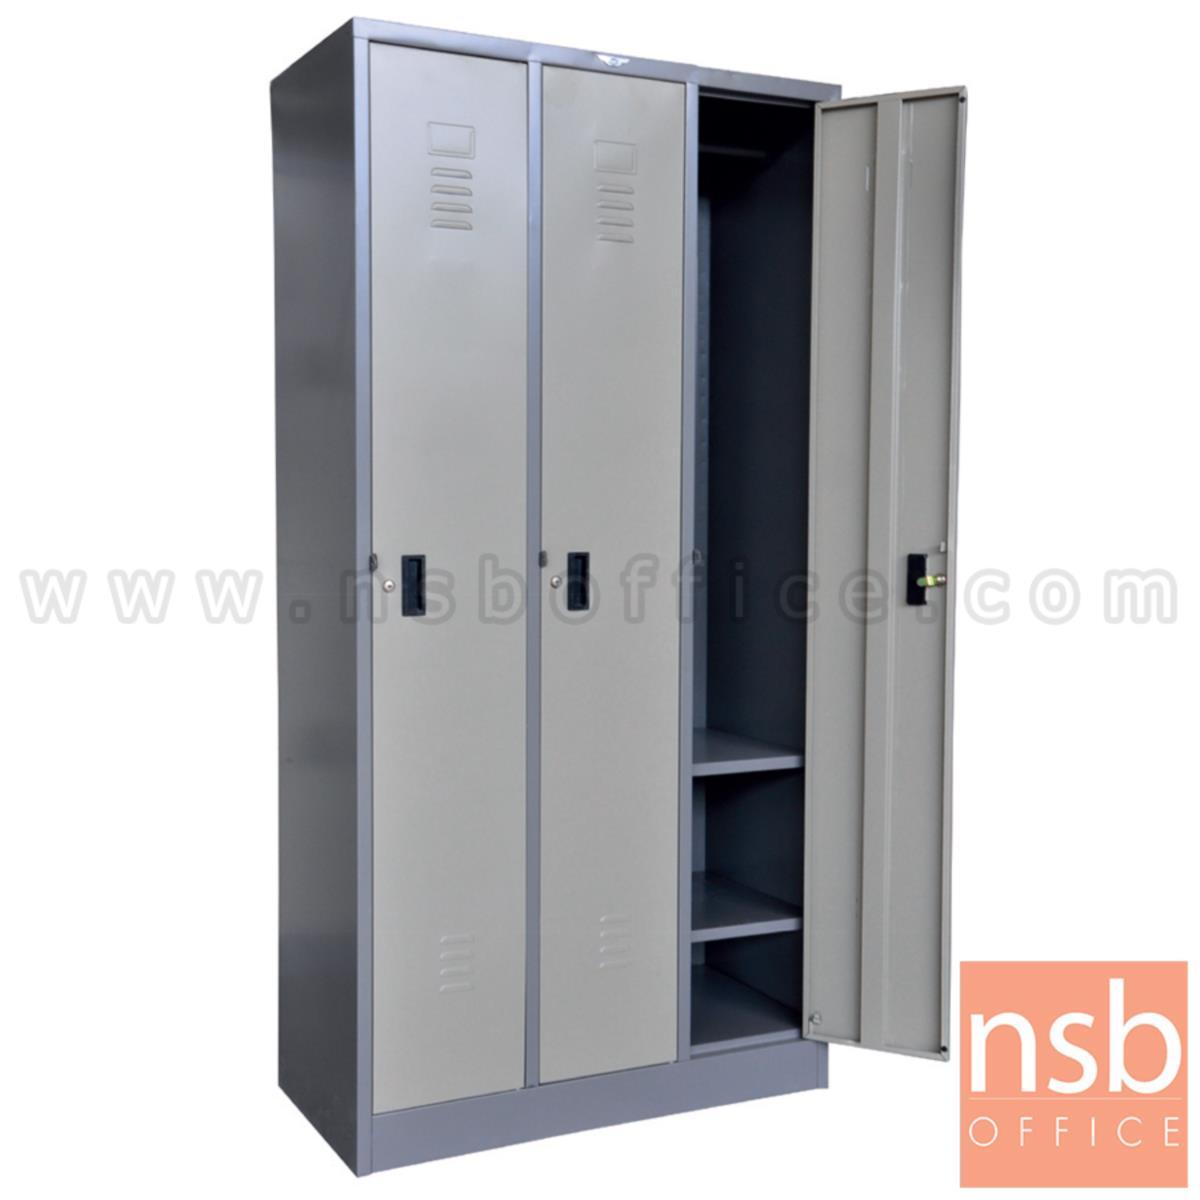 E08A005:ตู้ล็อกเกอร์ 3 ประตู รุ่น Fiennes (ไฟนส์)  ขนาด 91.4W*45.7D*182.9H cm.